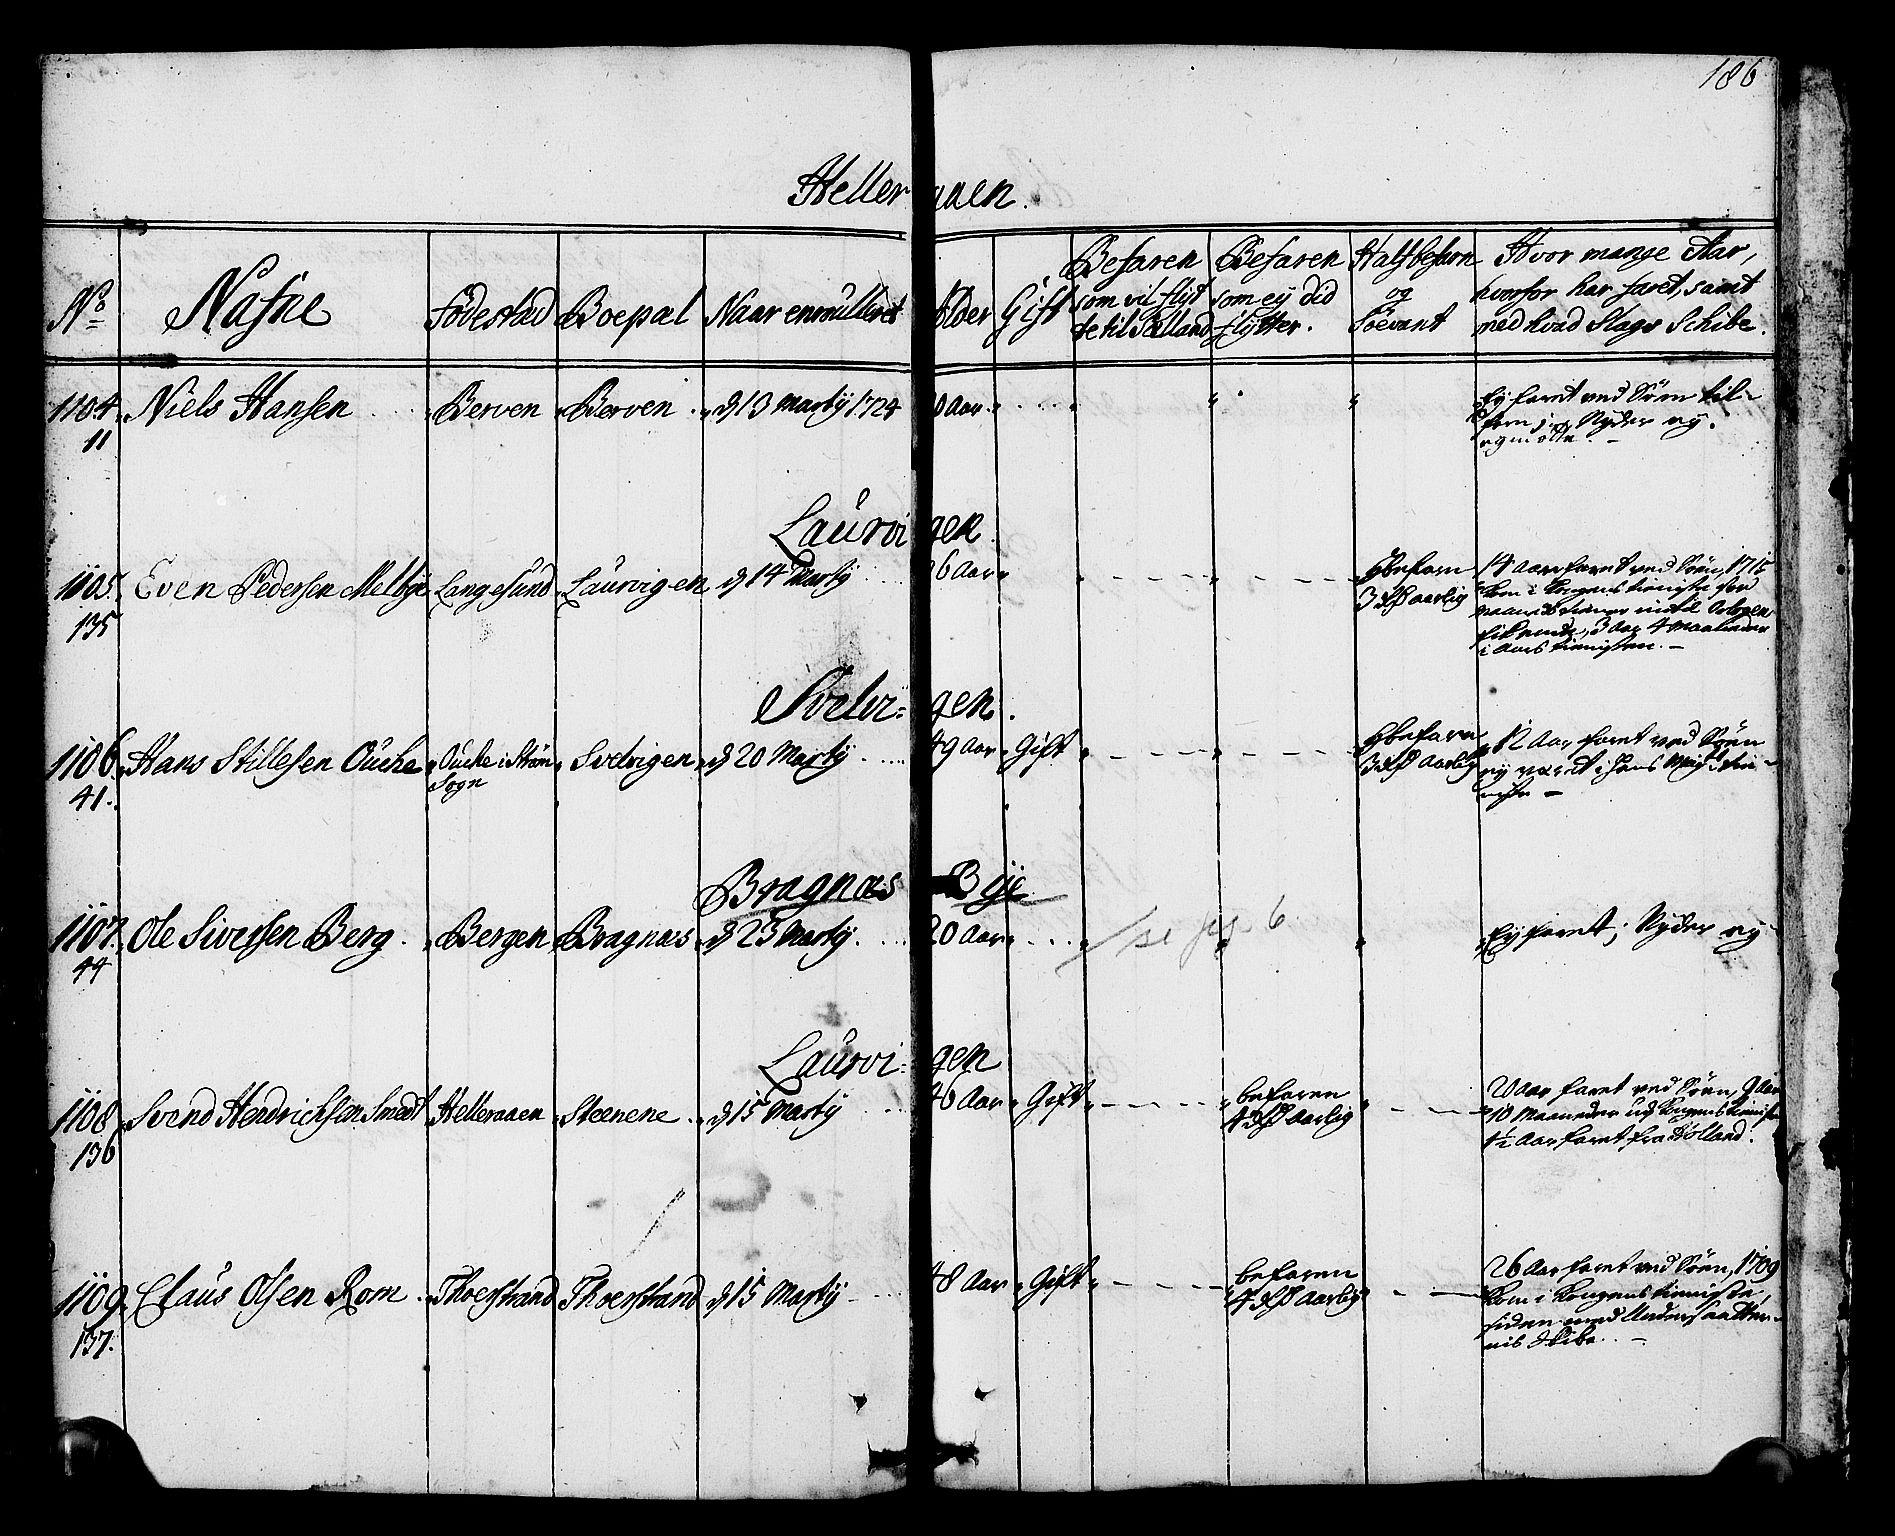 SAKO, Drammen innrulleringsdistrikt, F/Fa/L0002: Hovedrulle, 1723-1726, s. 187